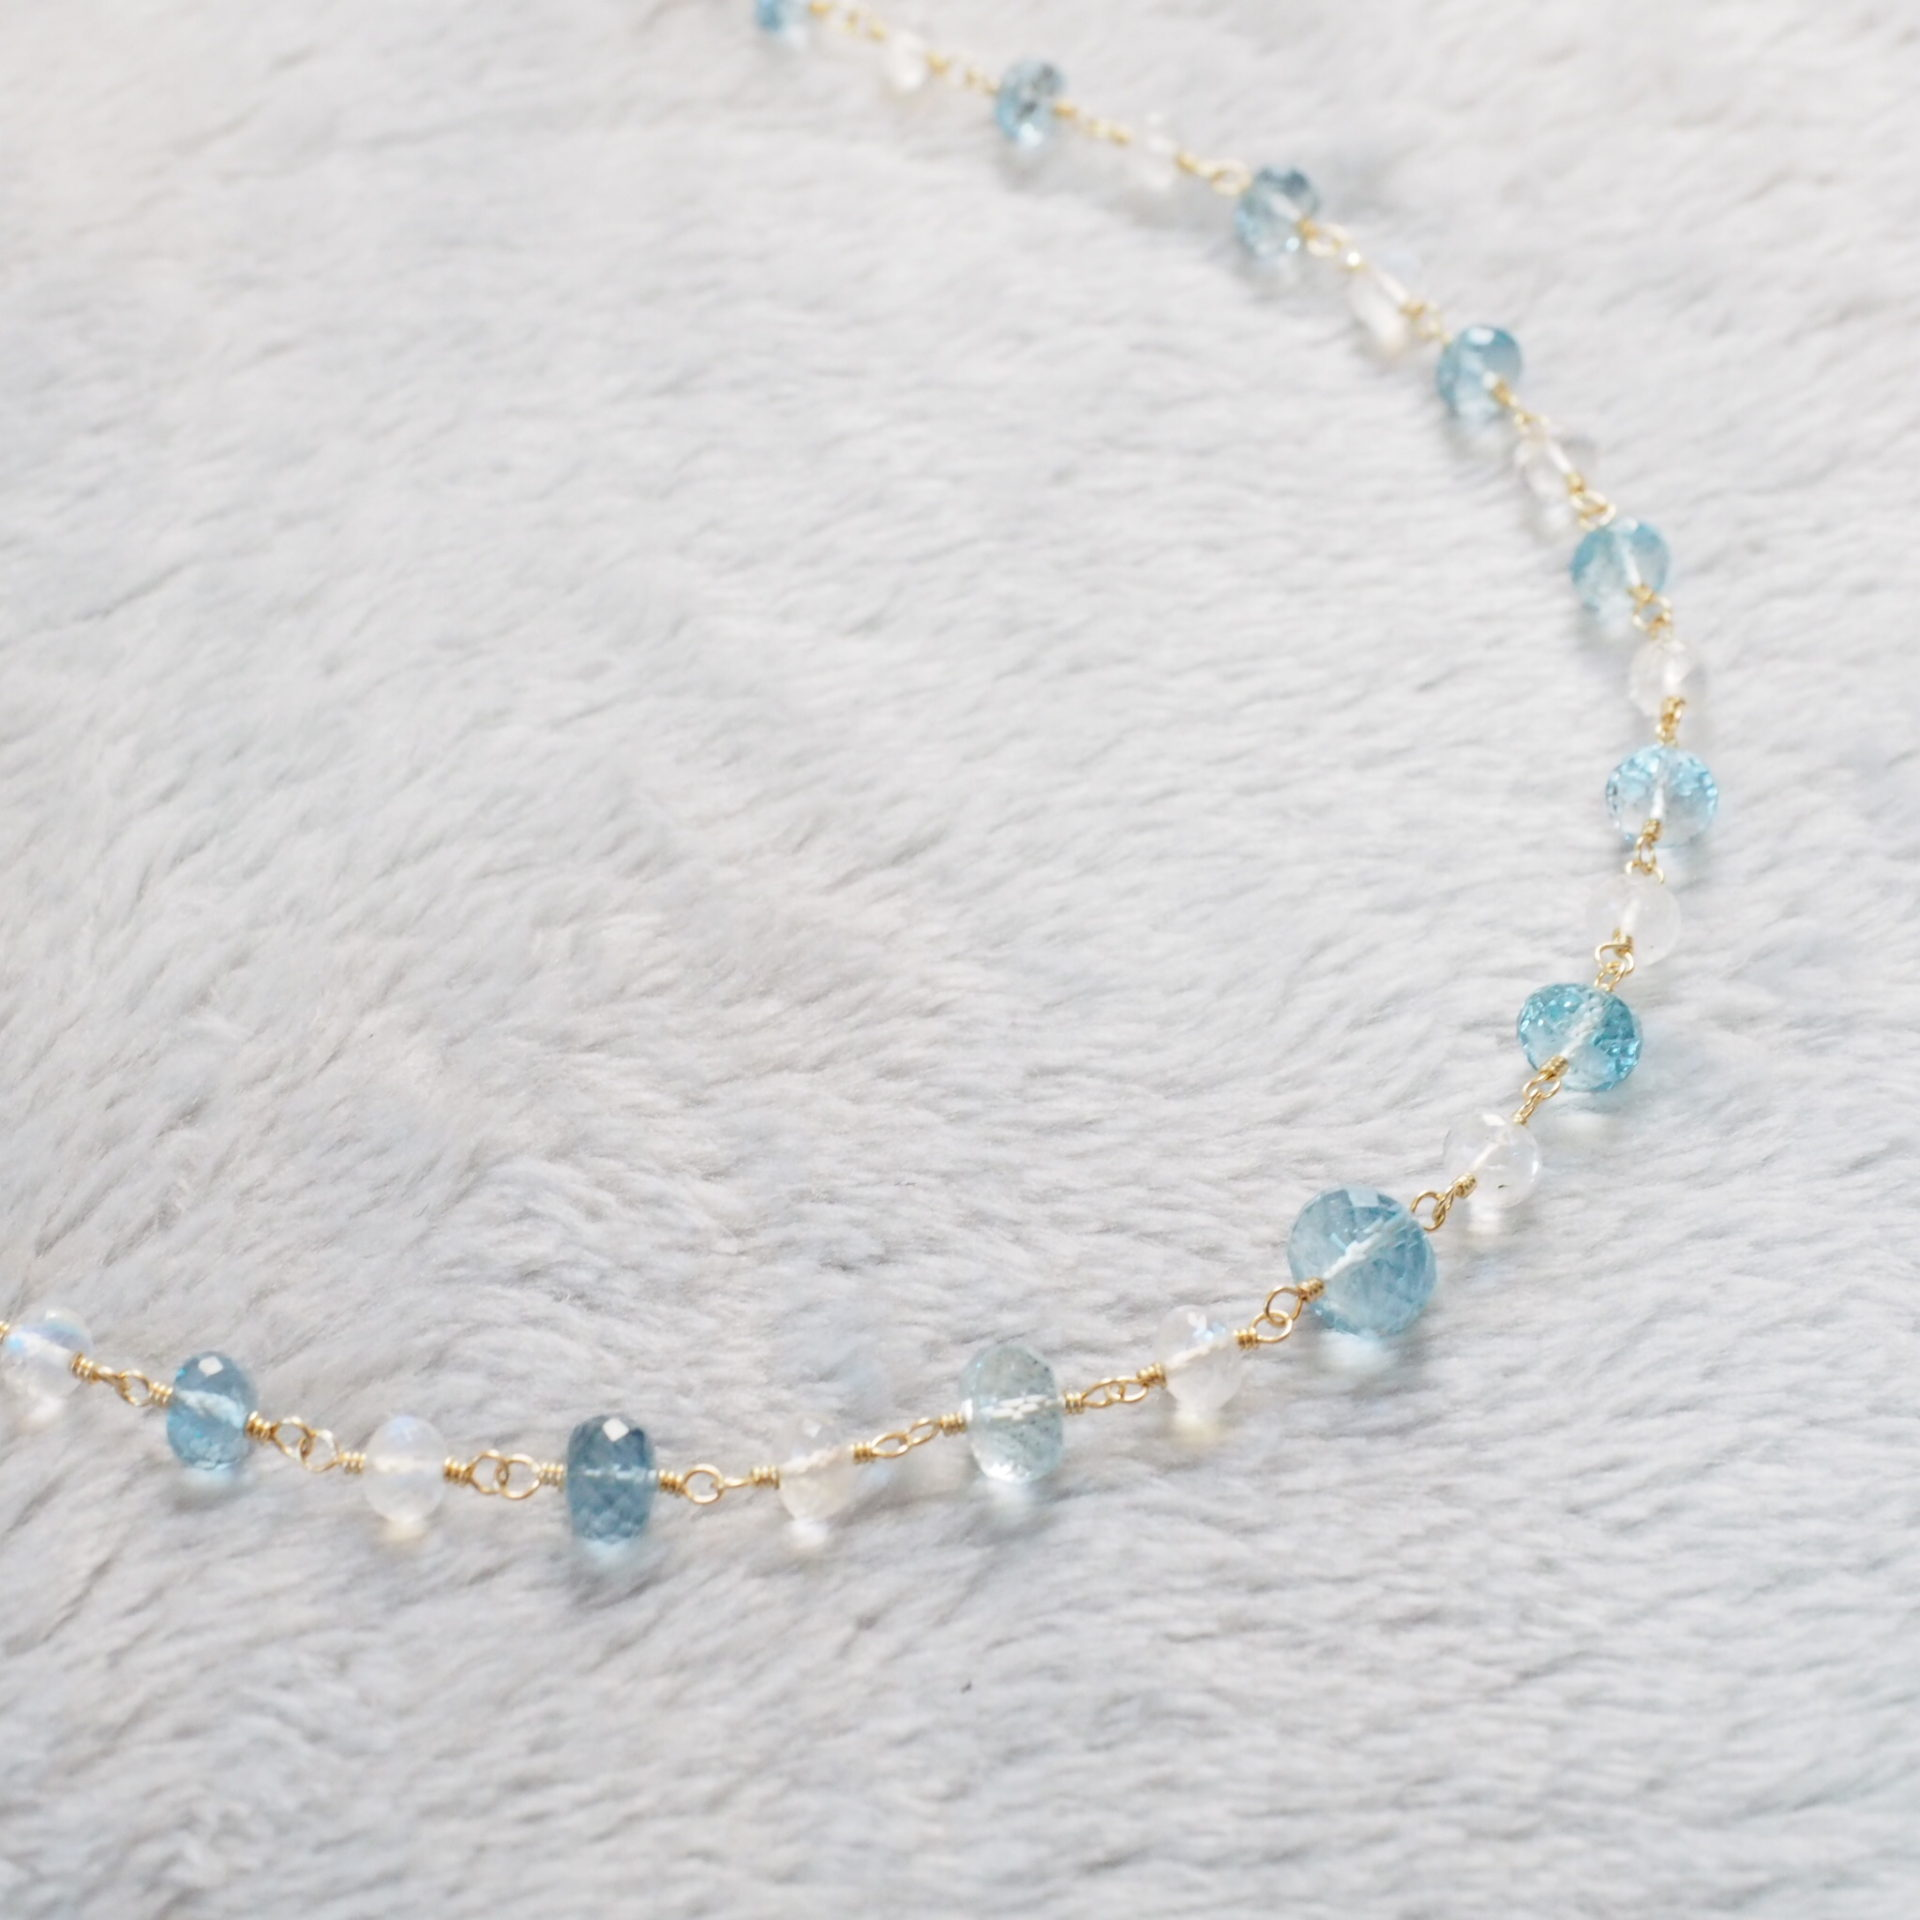 Aquamarine-White-Labradorite-Necklace